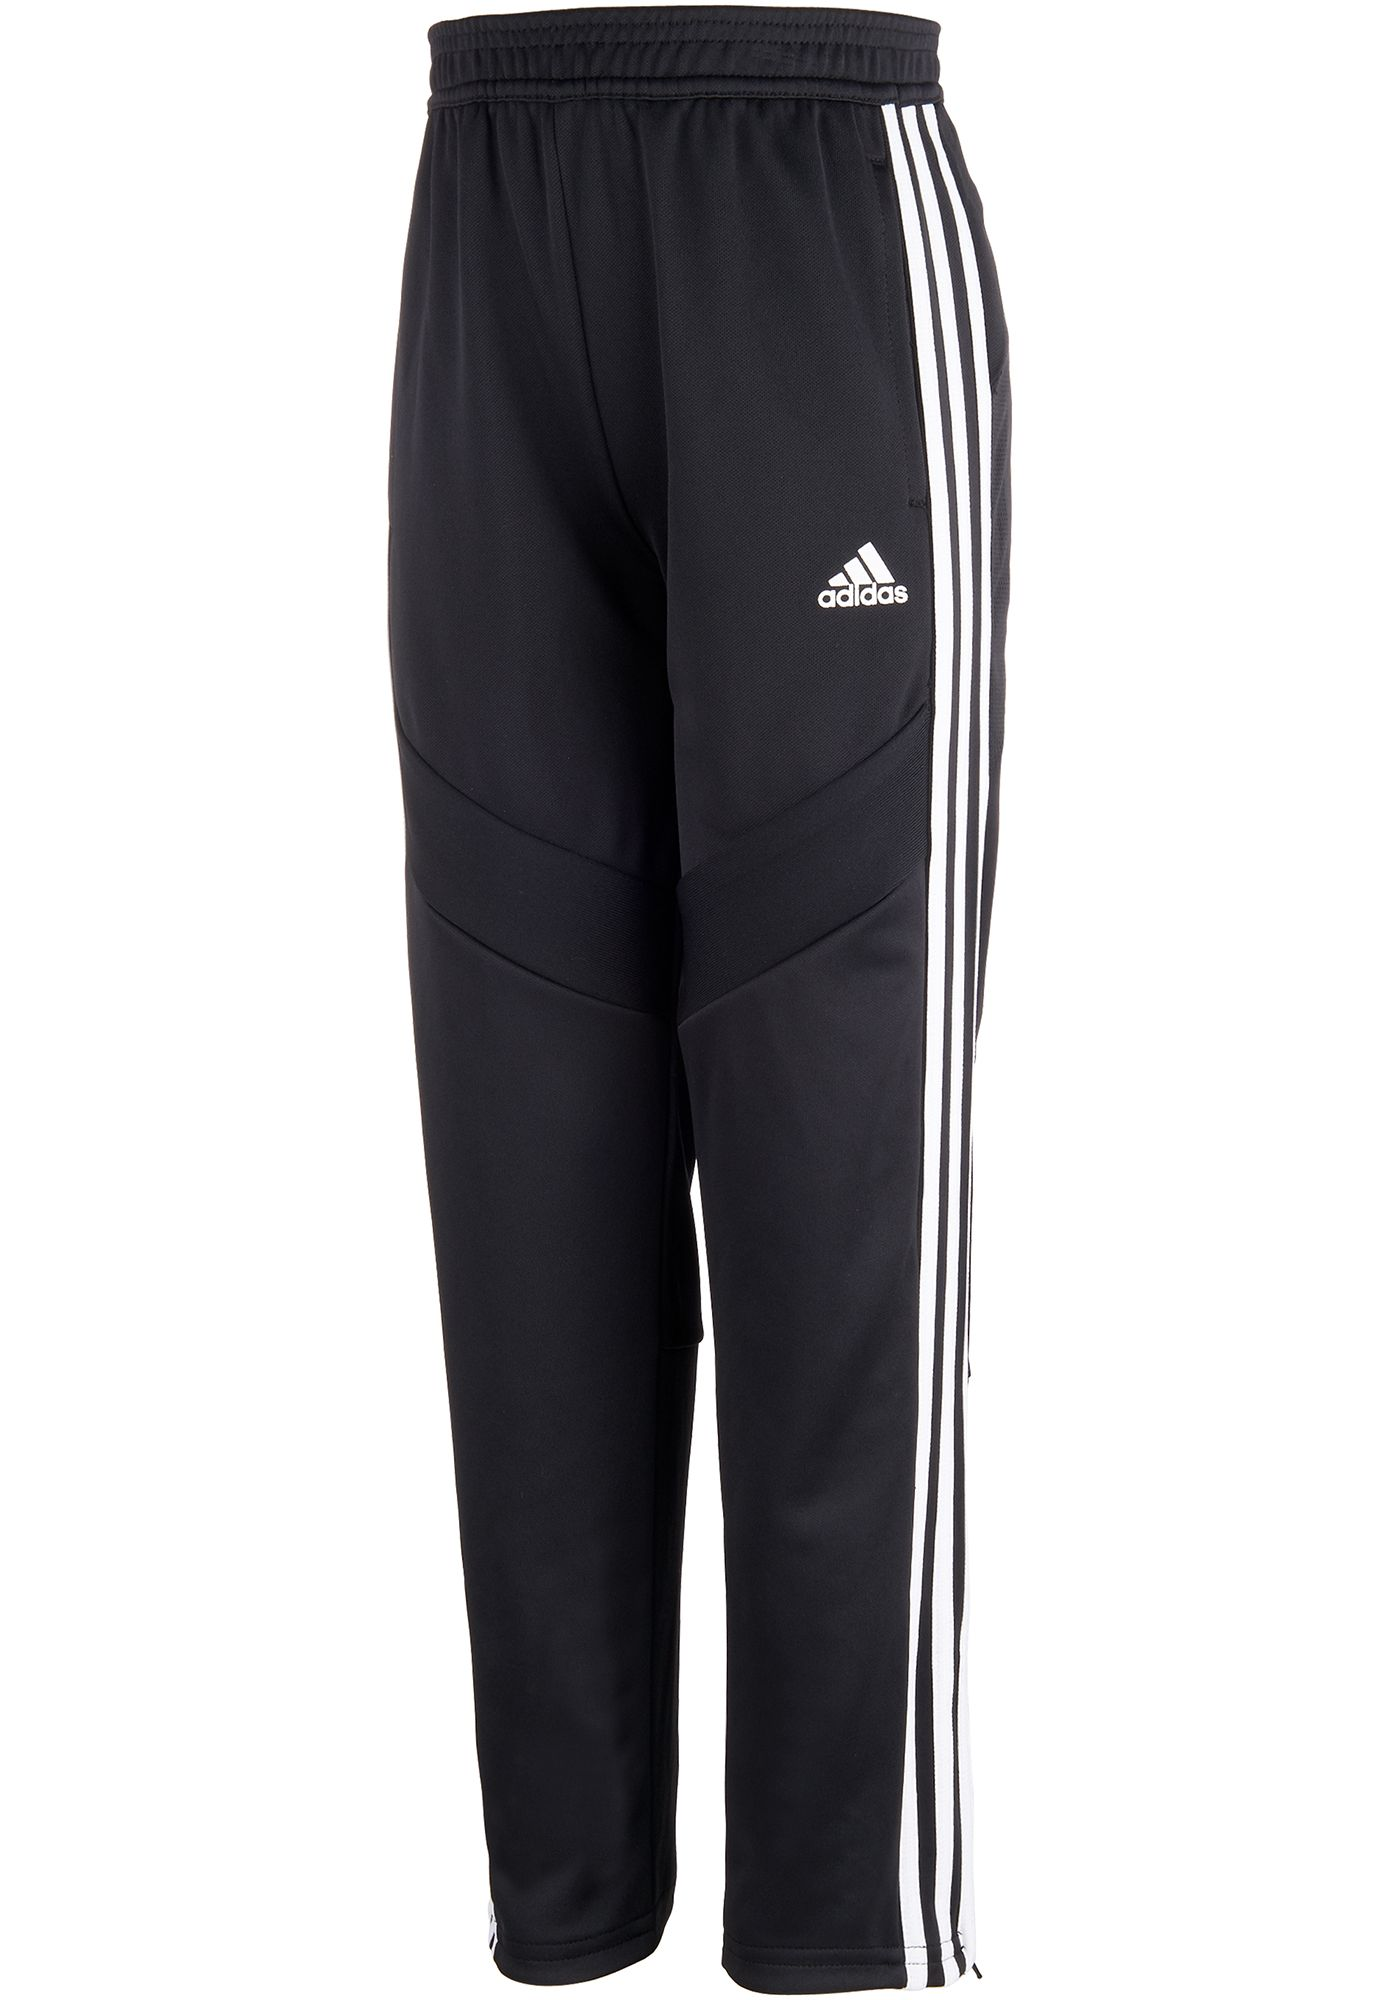 adidas Little Boys' Tiro 19 Pants